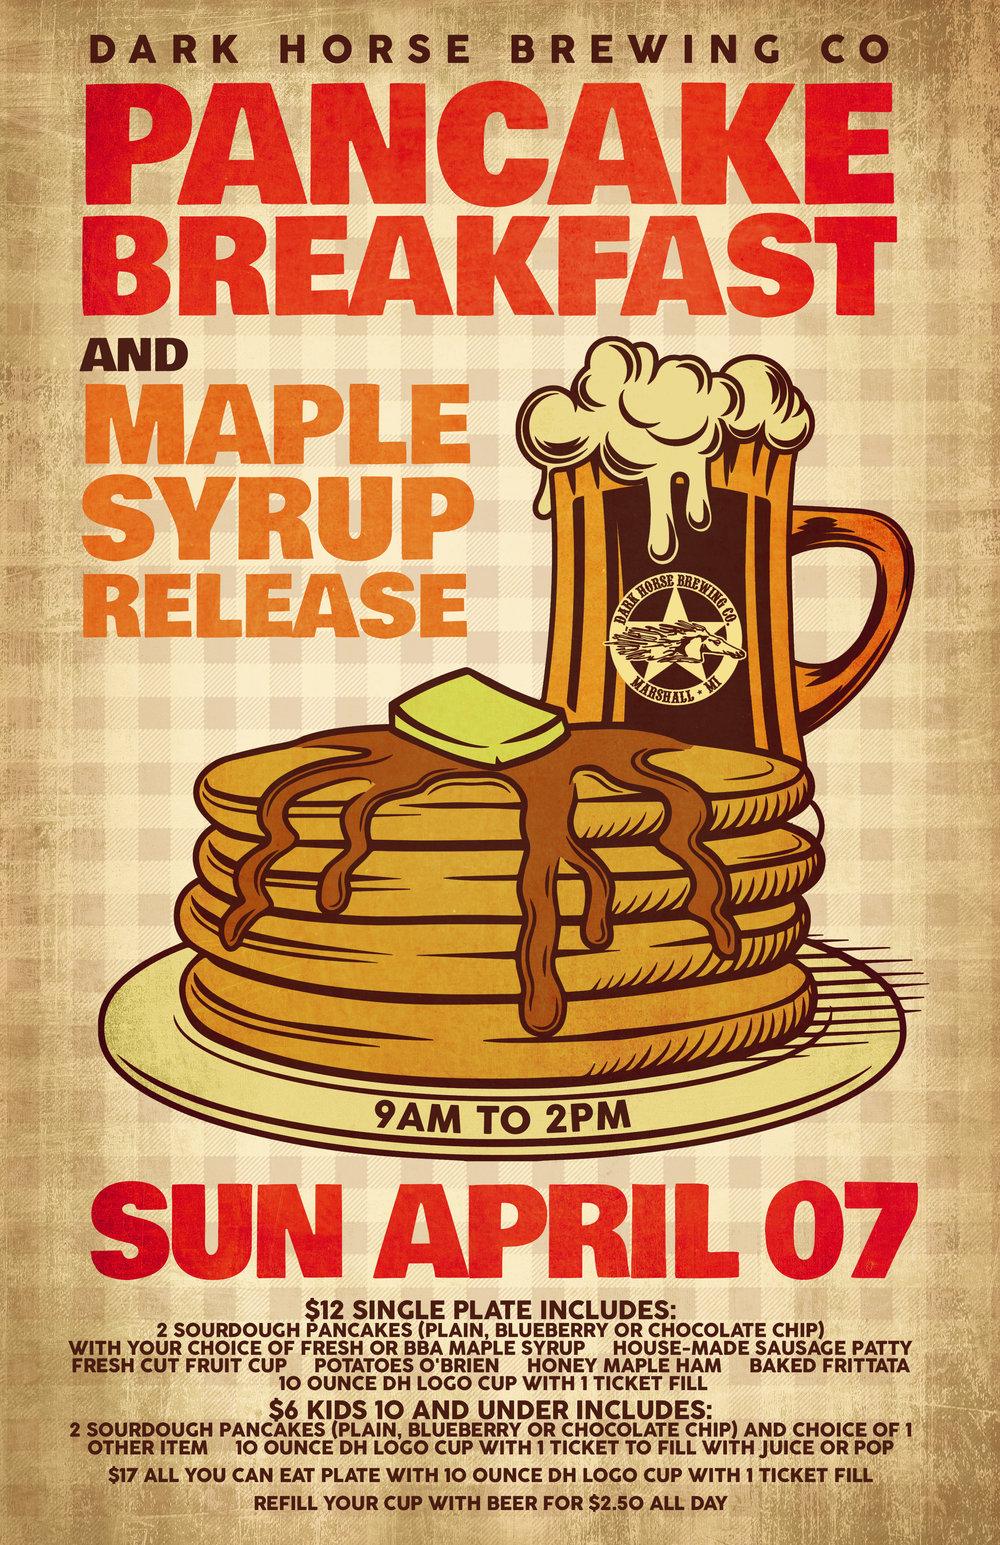 pancake breakfast dark horse.jpg